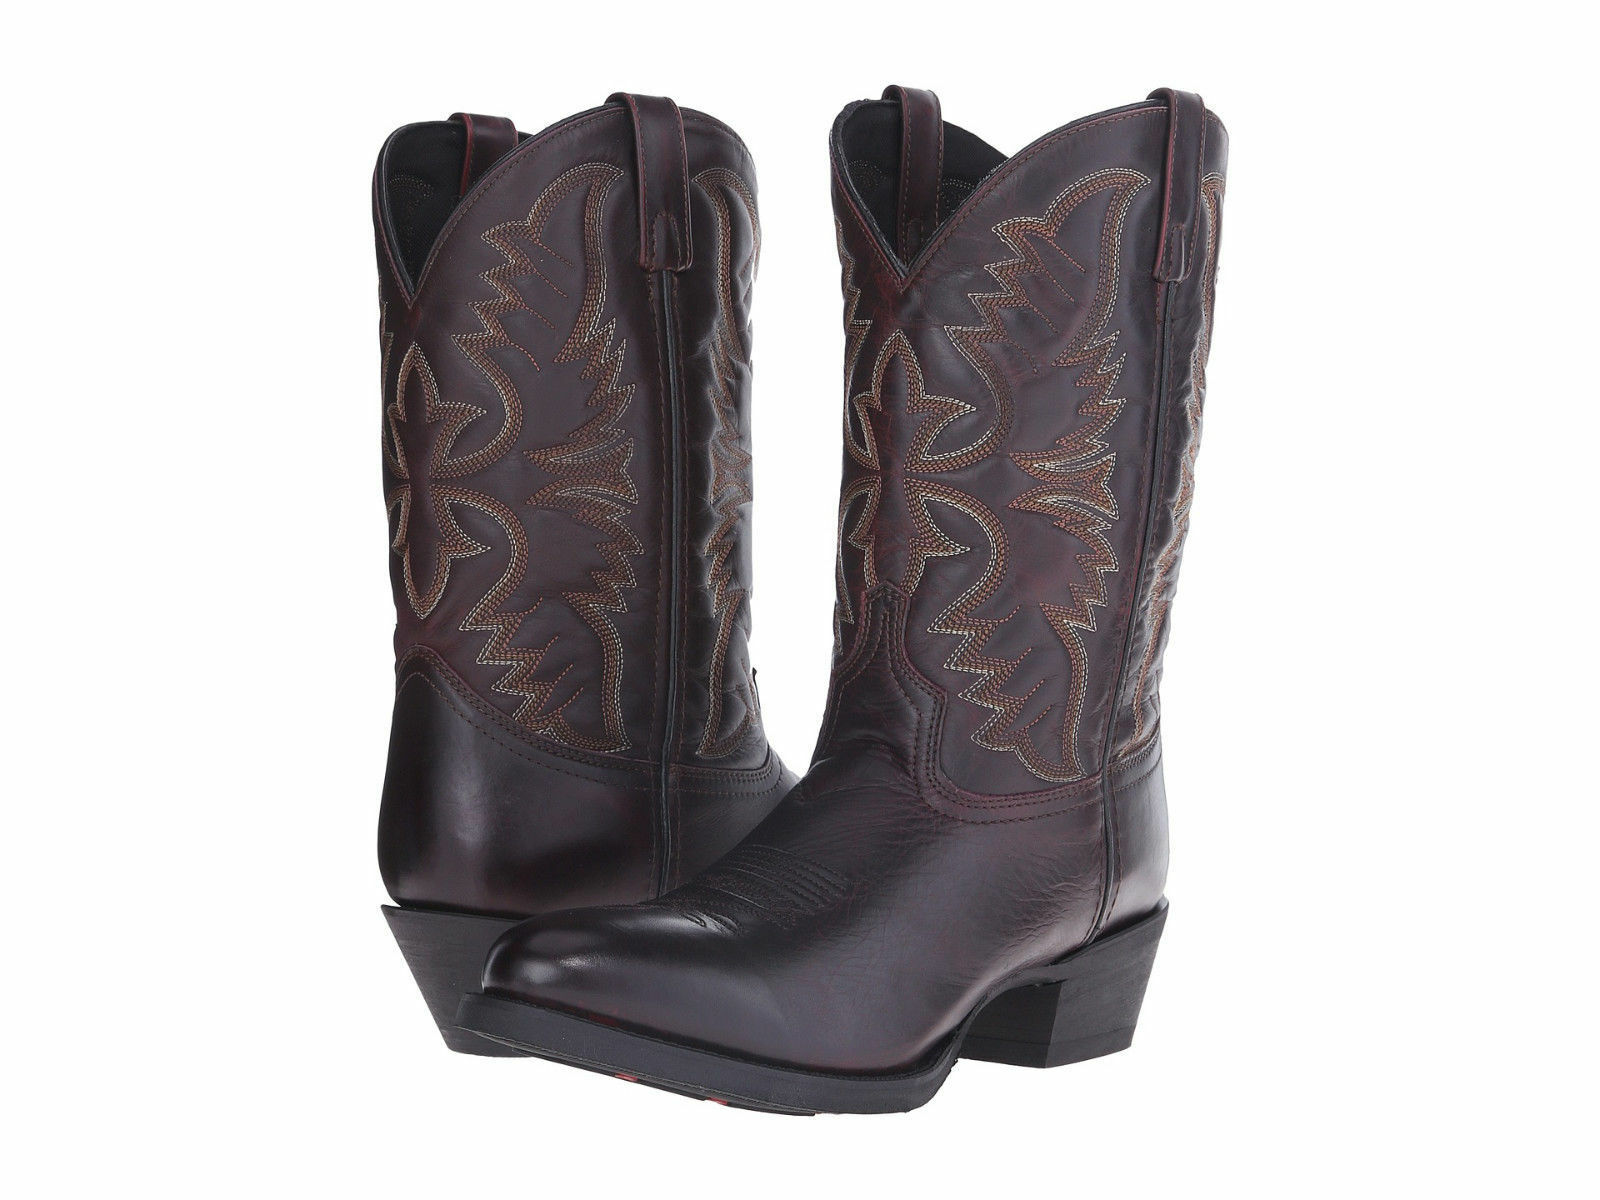 botas para hombre Negro Cereza Larojoo vaquero occidental 68458